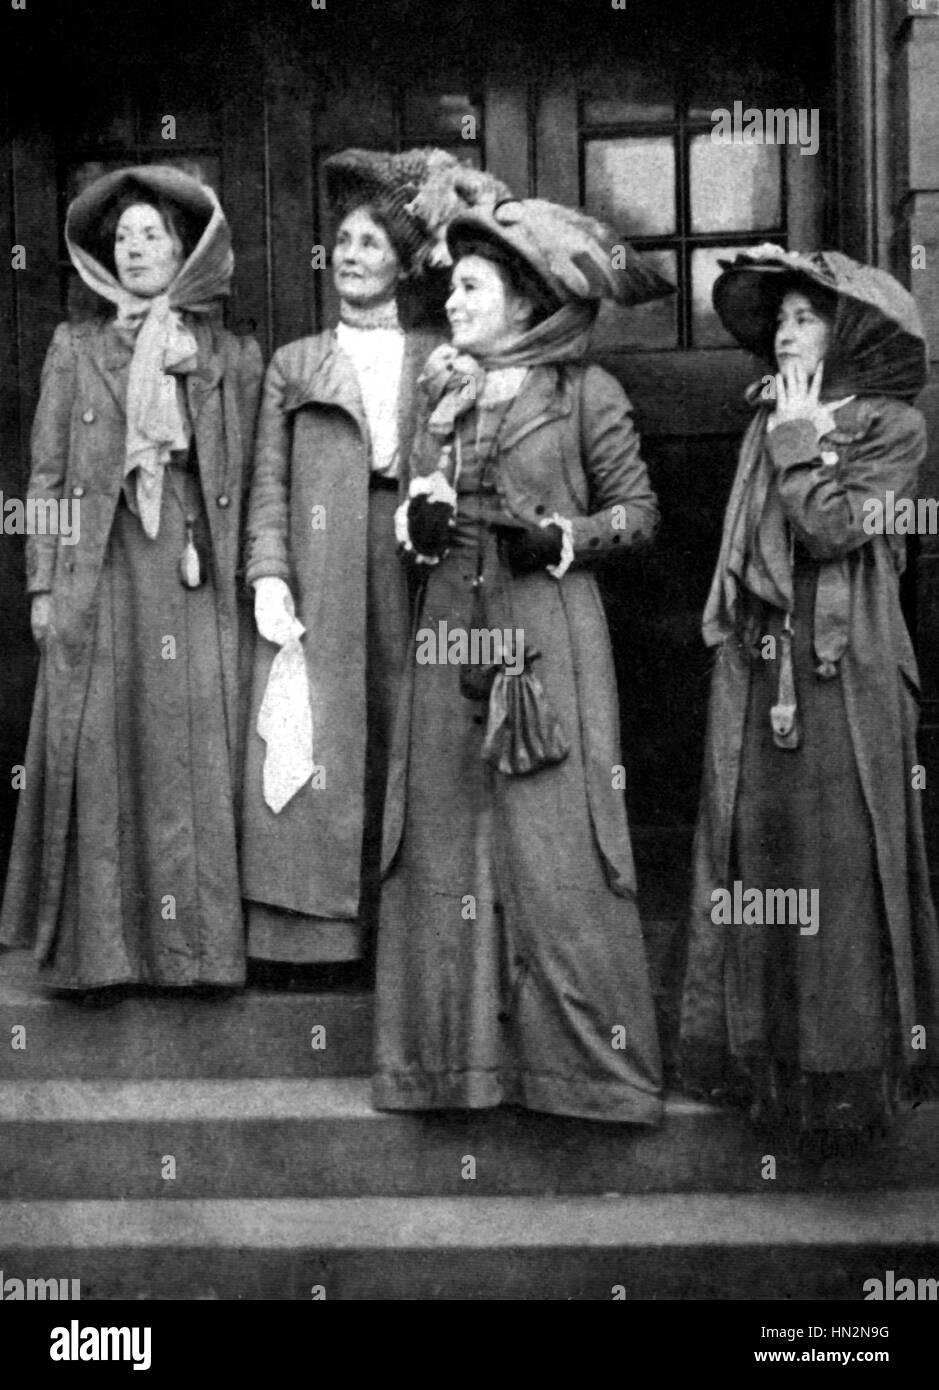 Principali leader dell'sufragettes. Da sinistra a destra: Christabel Pankhurst, Onorevole Pankhurst, Pethick Lawrence, Adela Pankhurst. Inizio del XX secolo Foto Stock